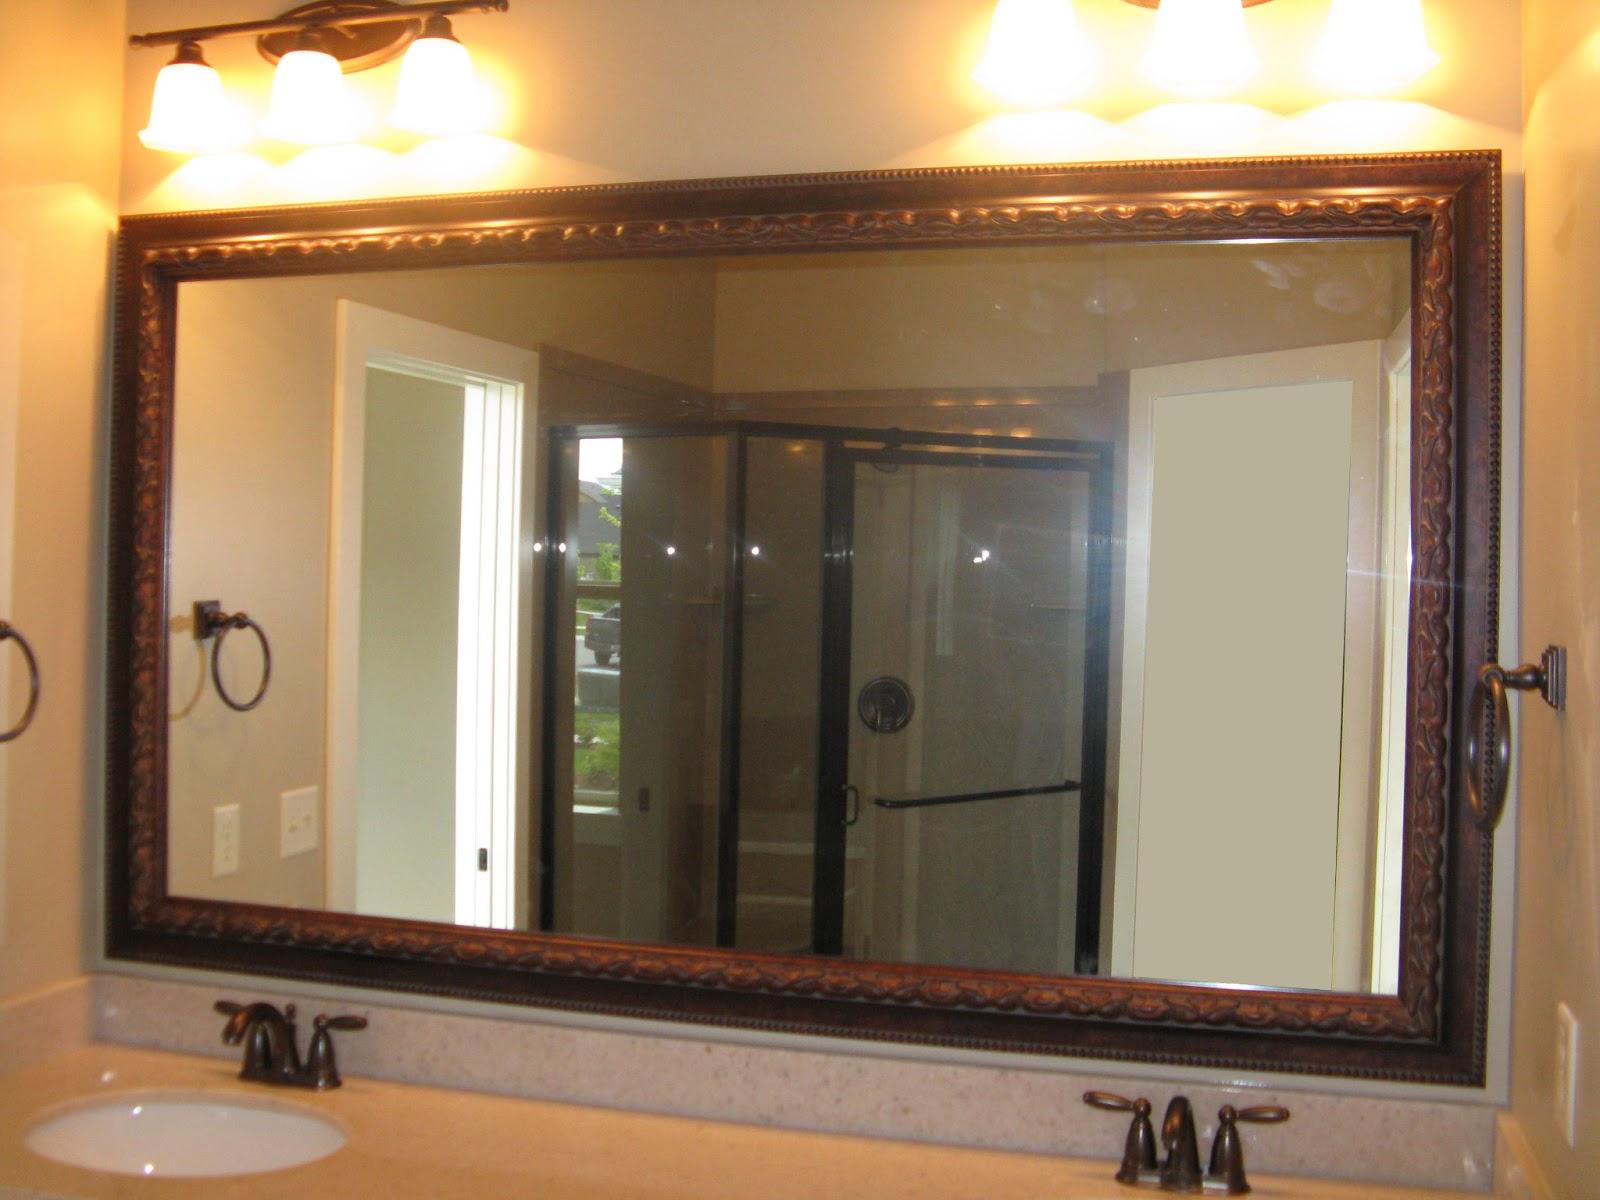 Reflected design same mirror frame kit 4 different looks - Mirror frame kits for bathroom mirrors ...